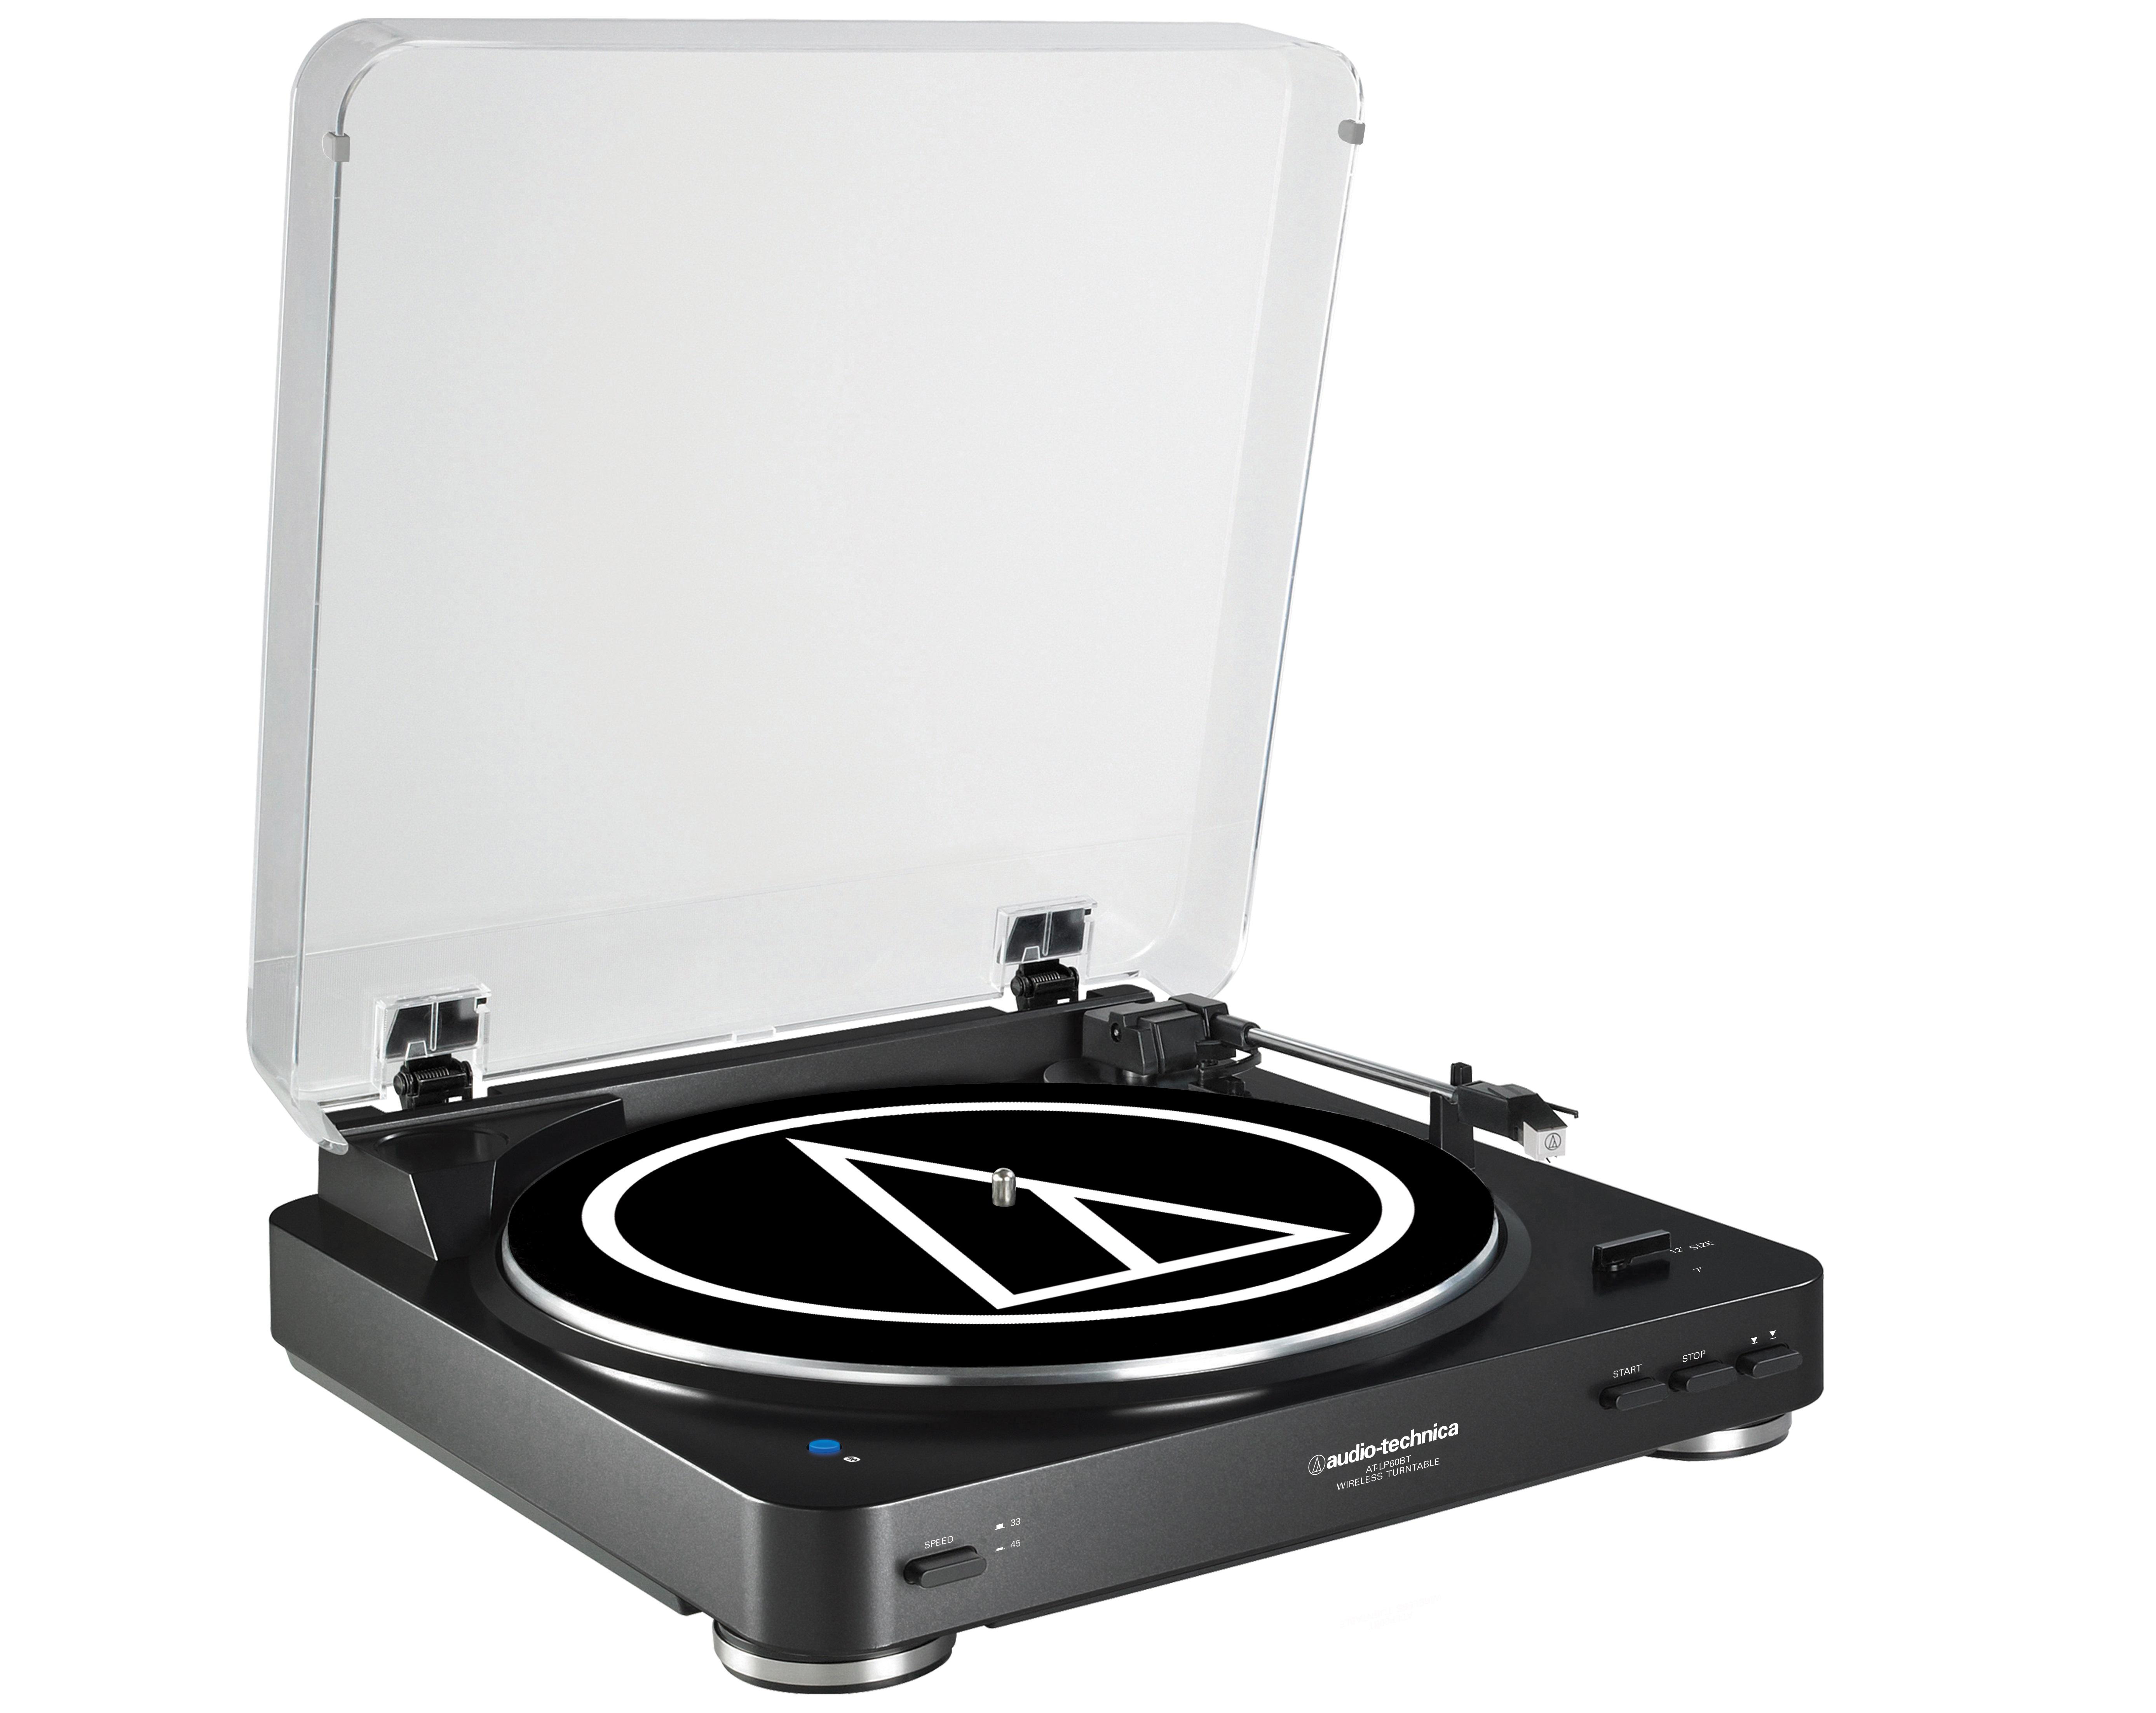 The Audio-Technica LP60-BT turntable